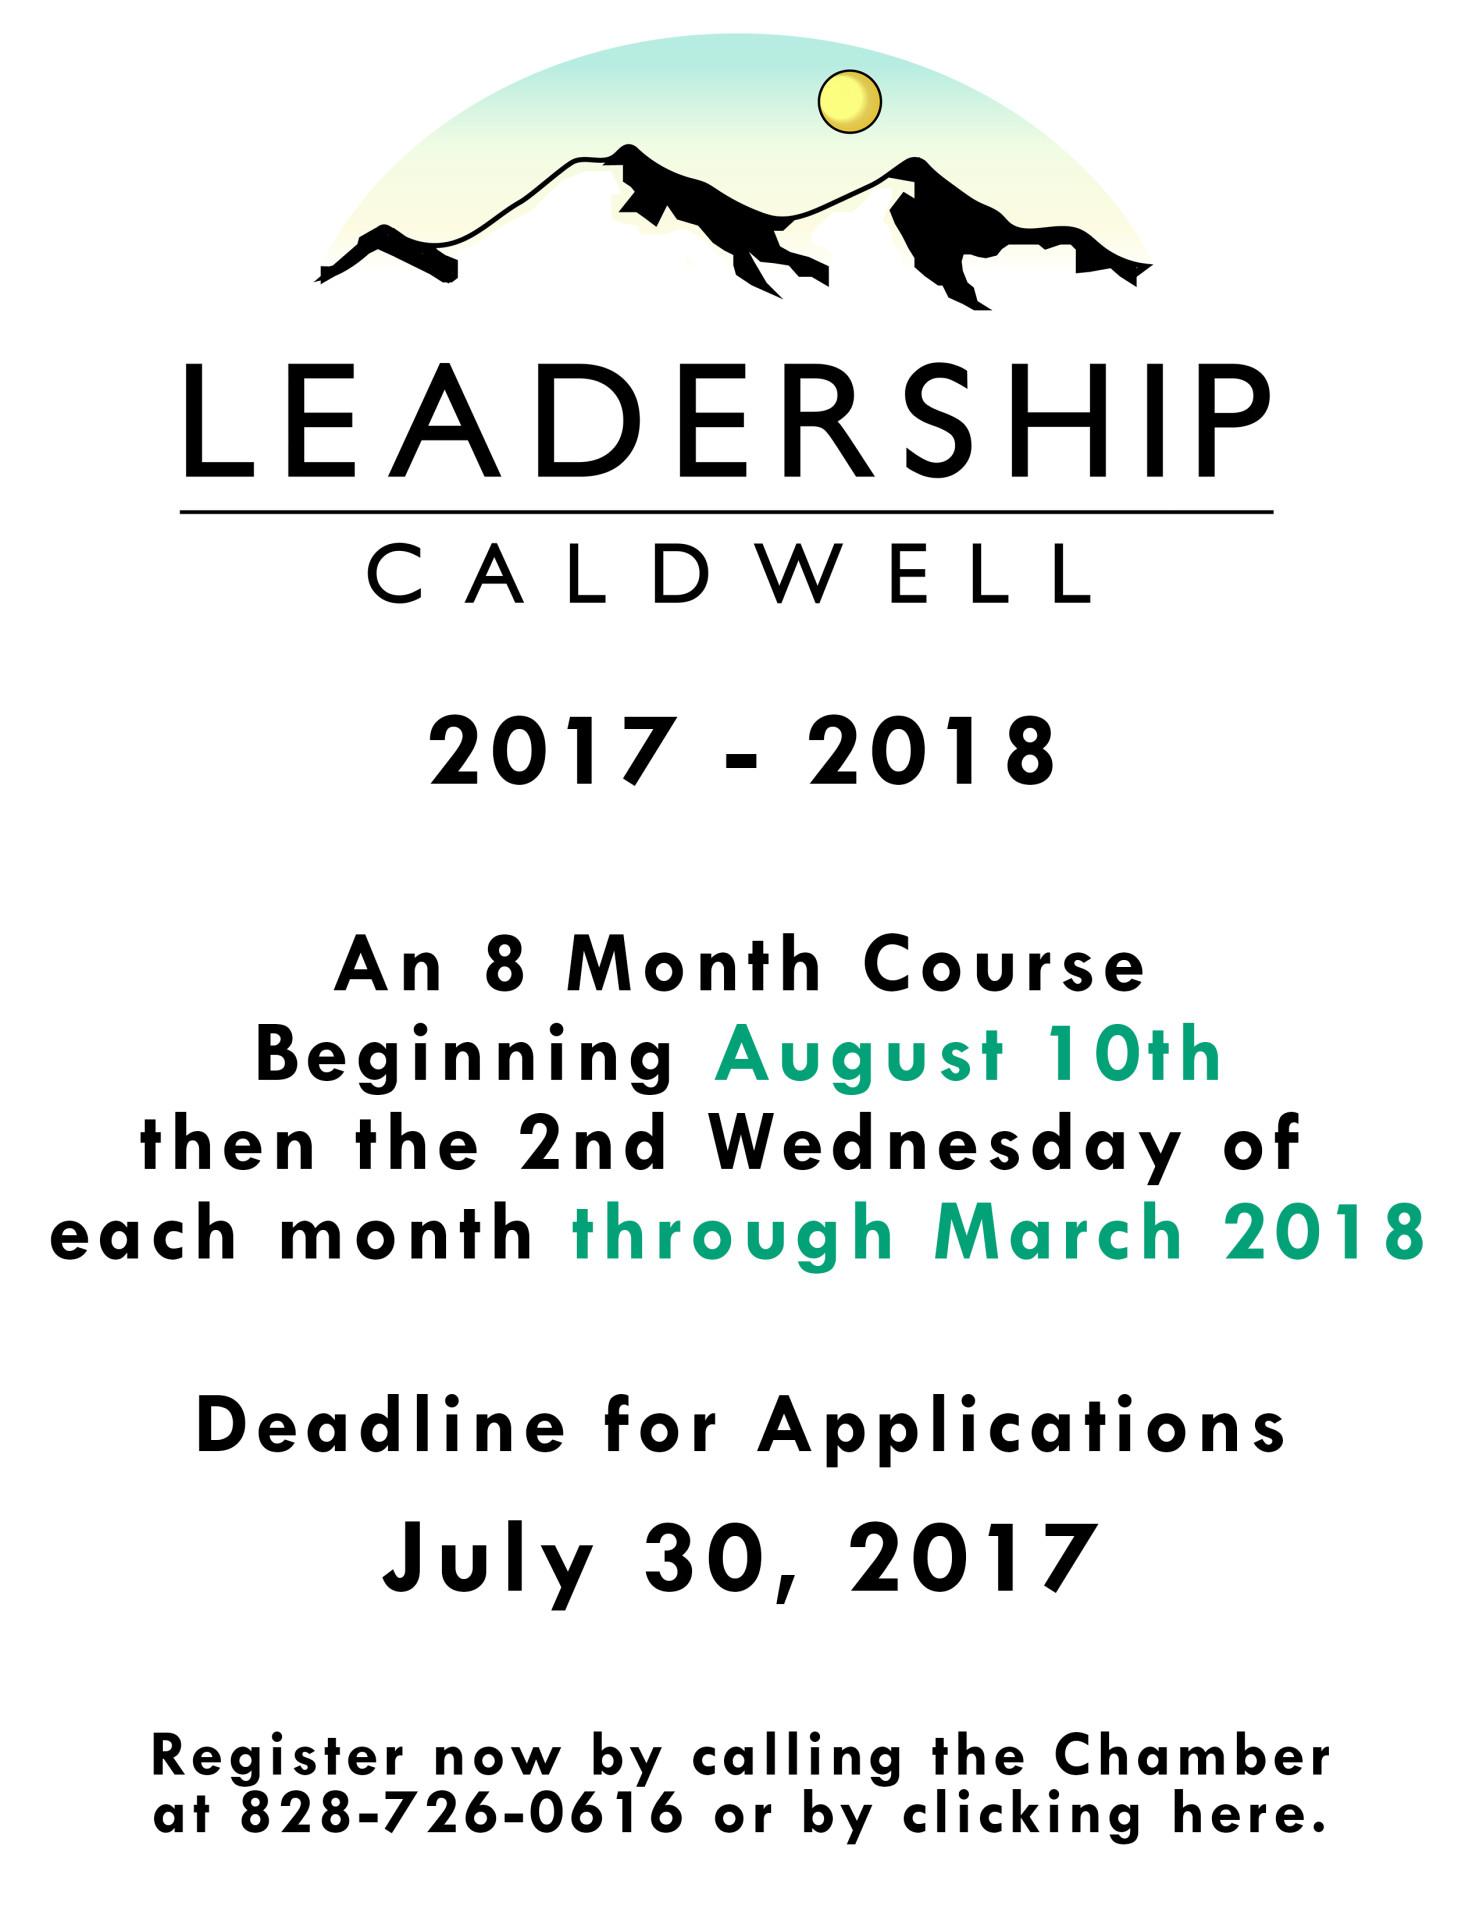 leadershipcaldwell-w1483.jpg